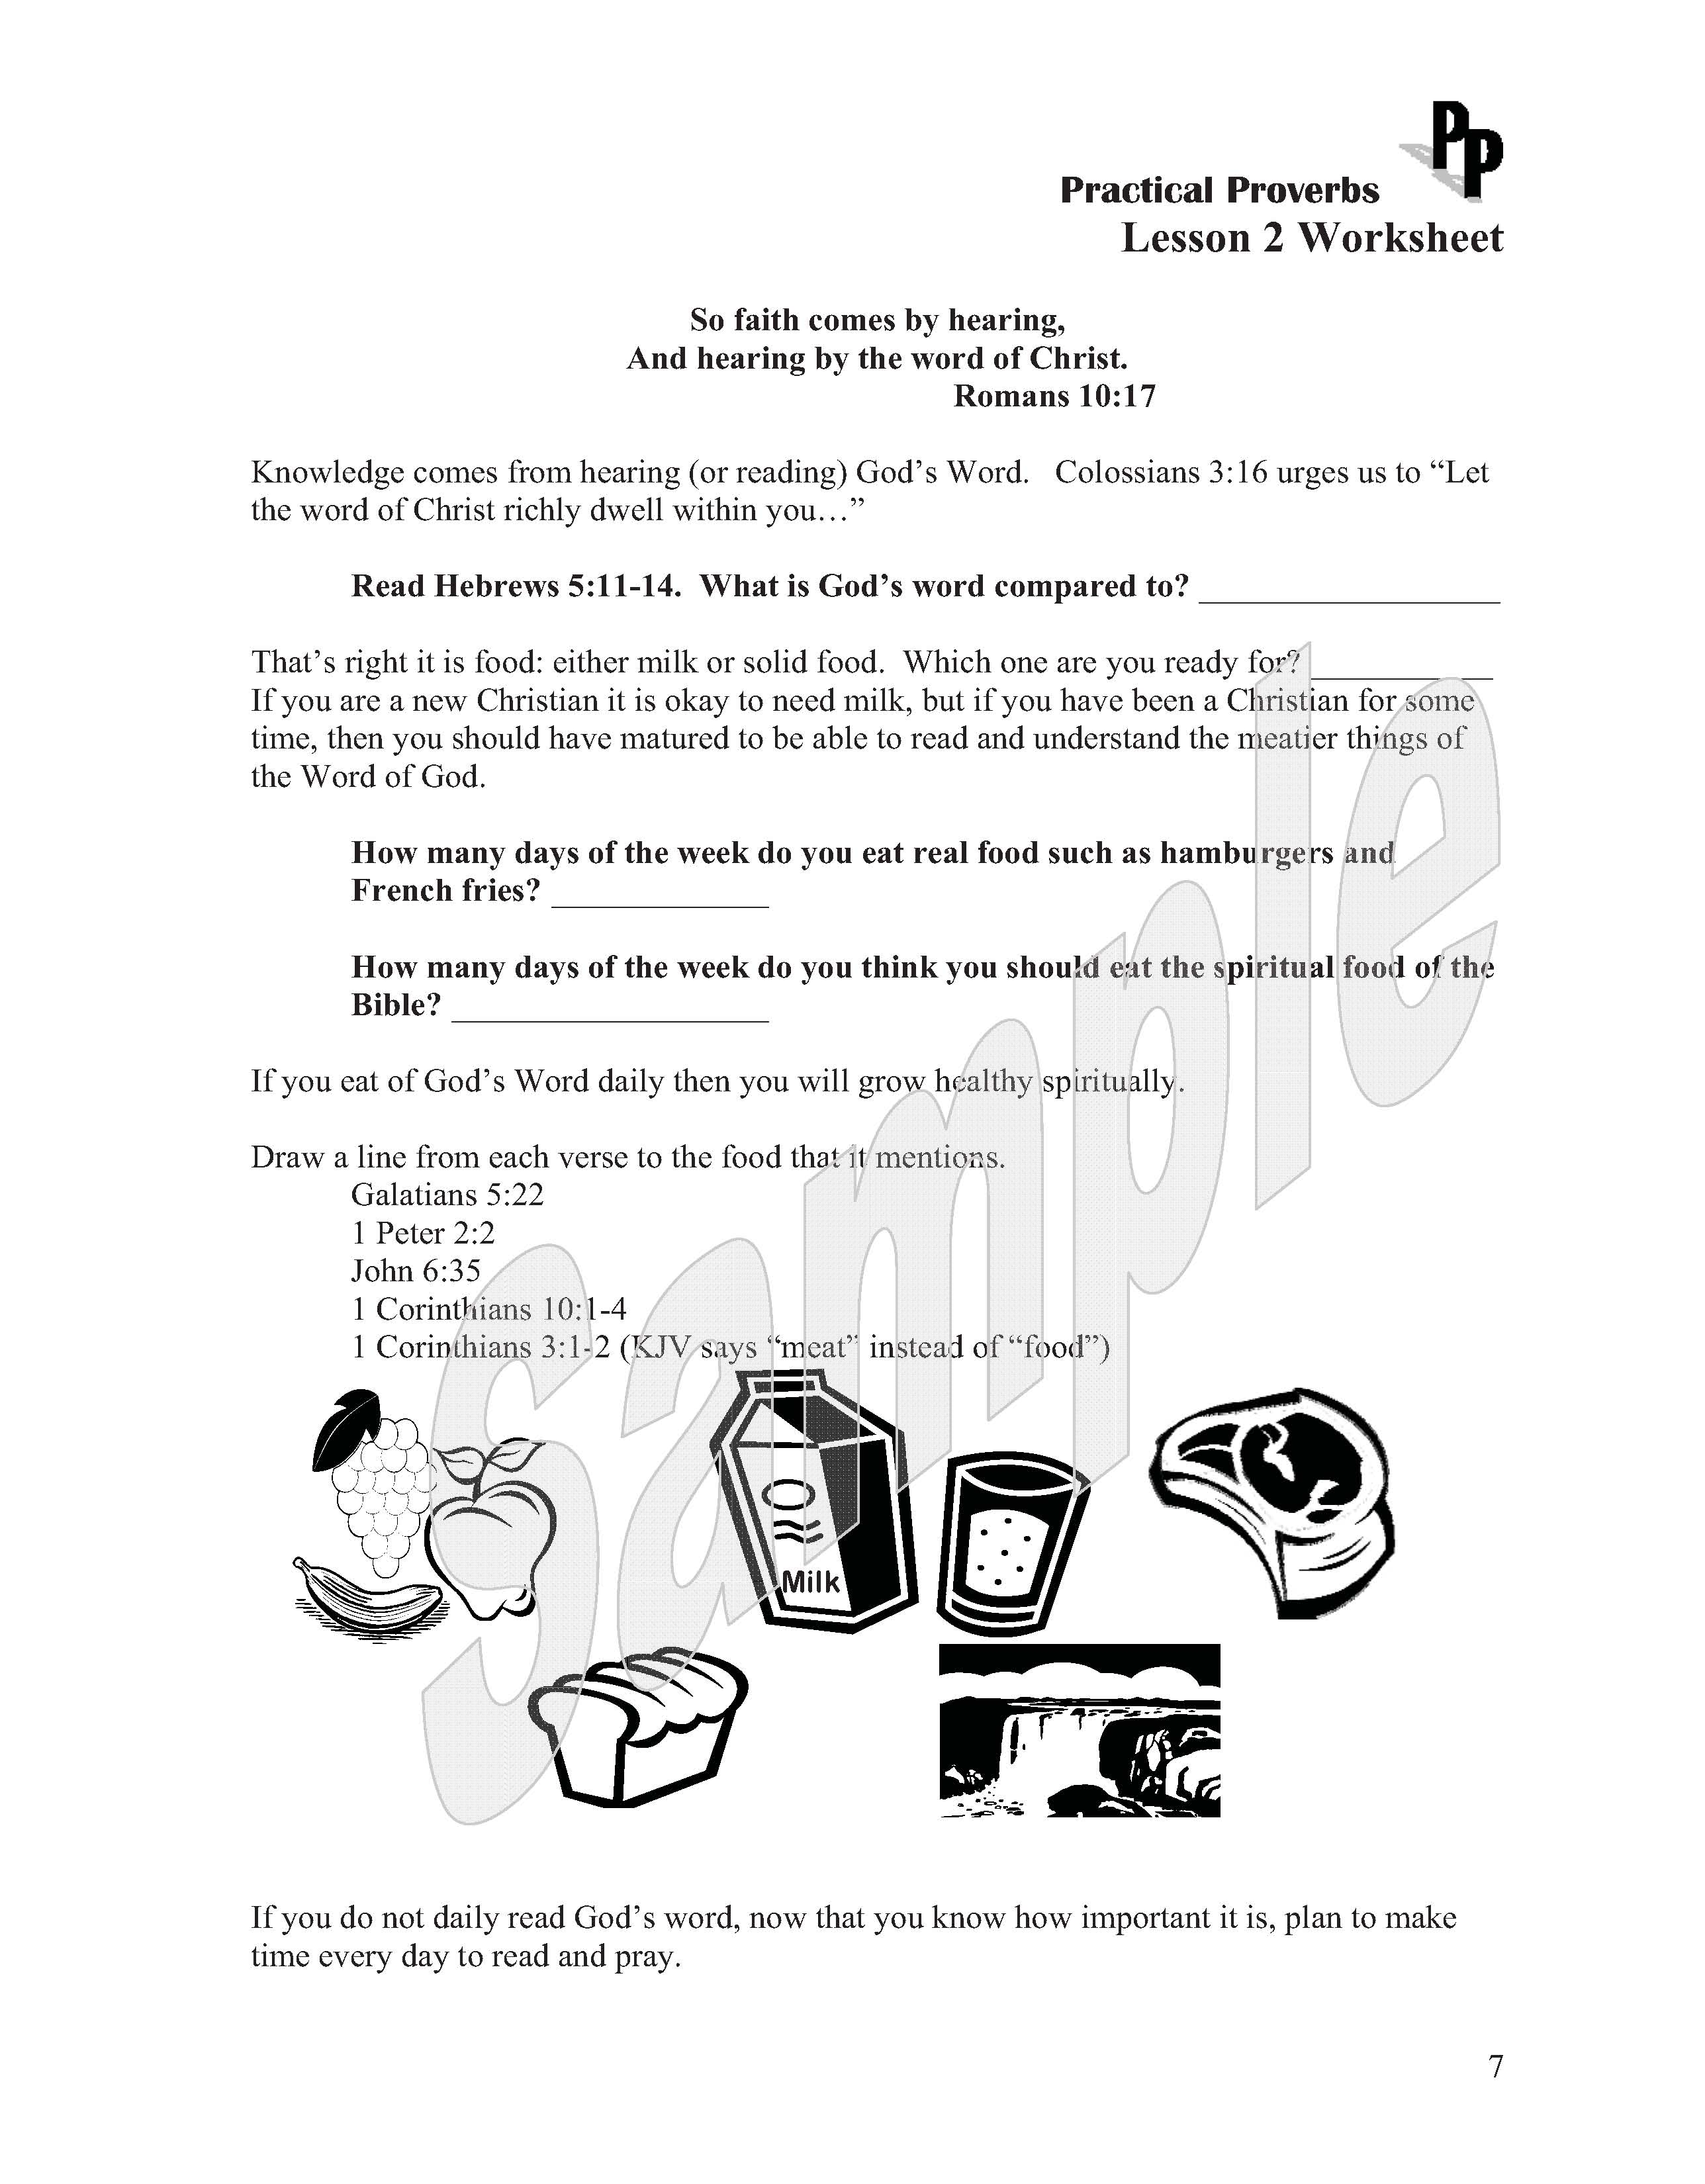 Proverbs Worksheets For Grade 5 Worksheets for Education – Nova Absolute Zero Worksheet